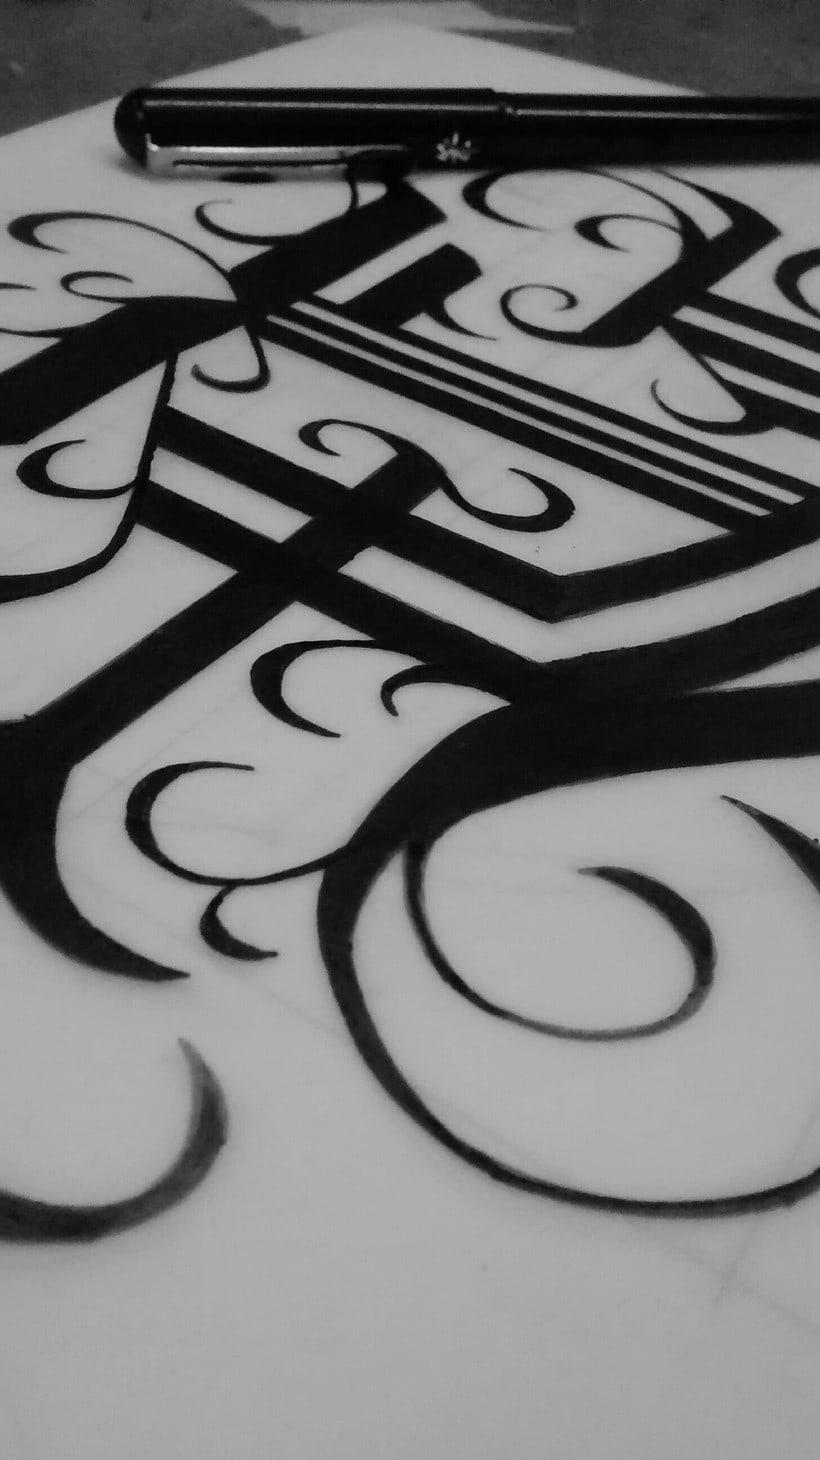 Monograma con estilo gótico: Eduardo García 3